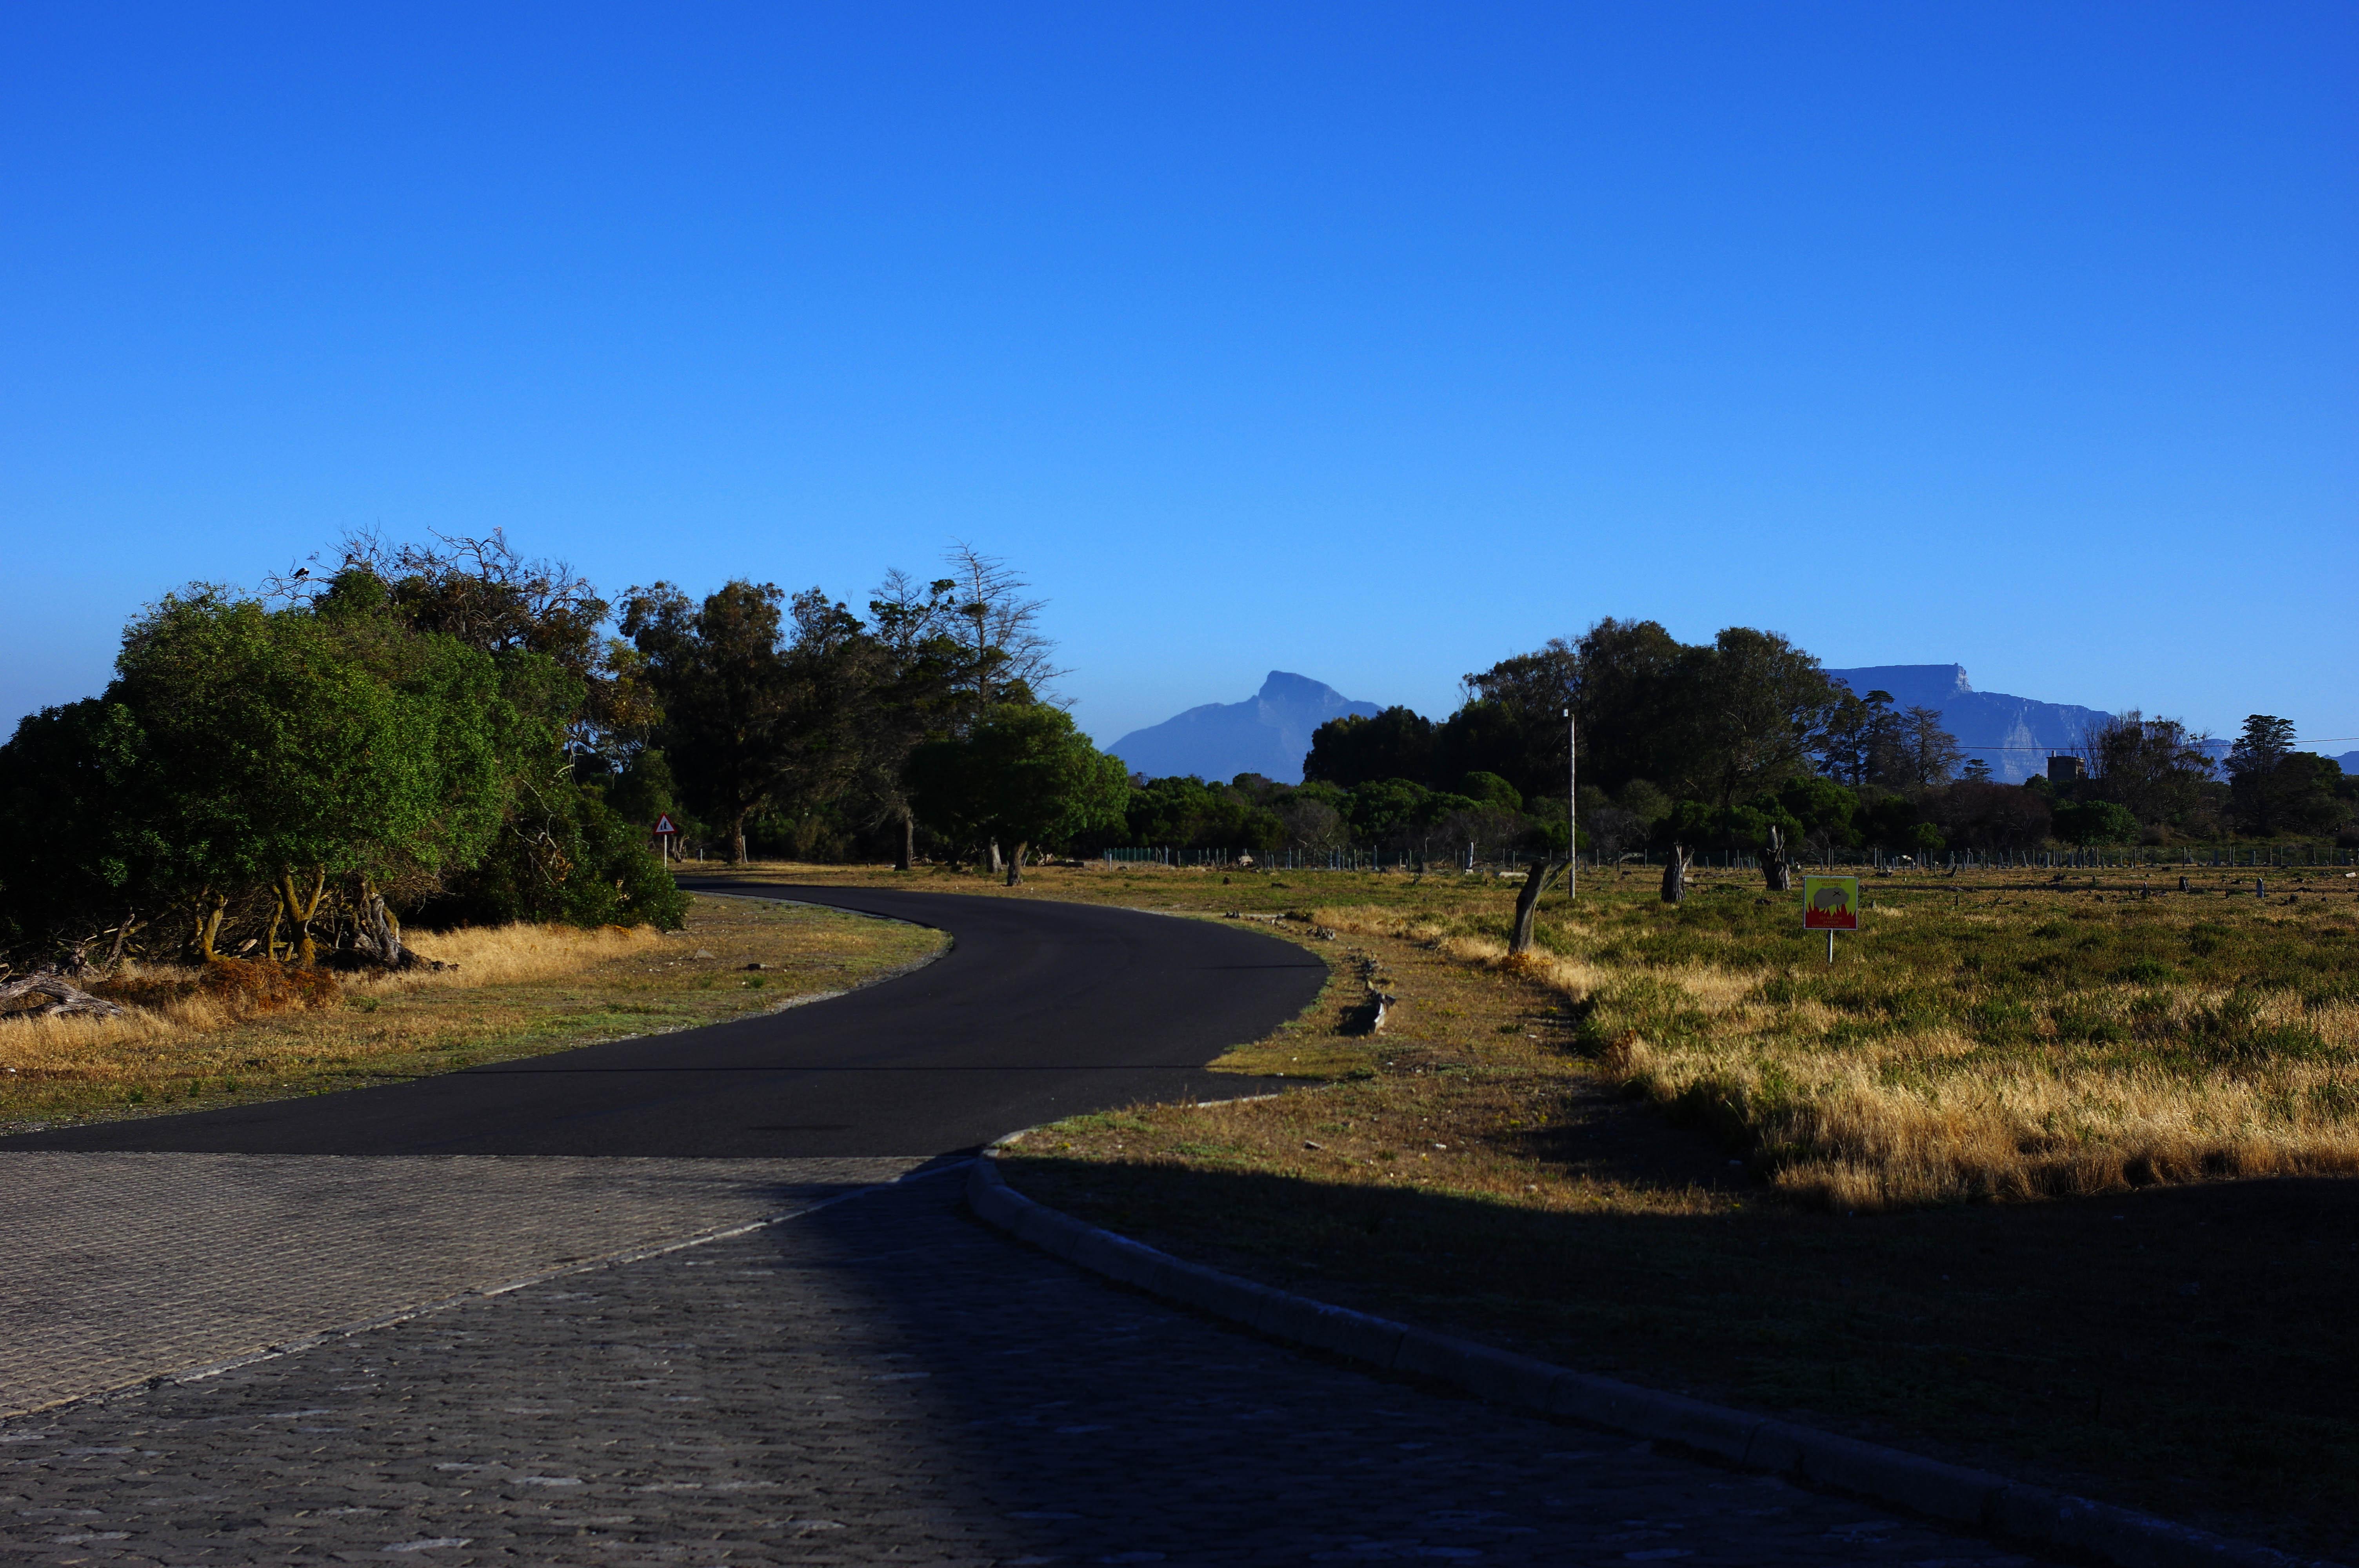 171122_CT_Robben island32